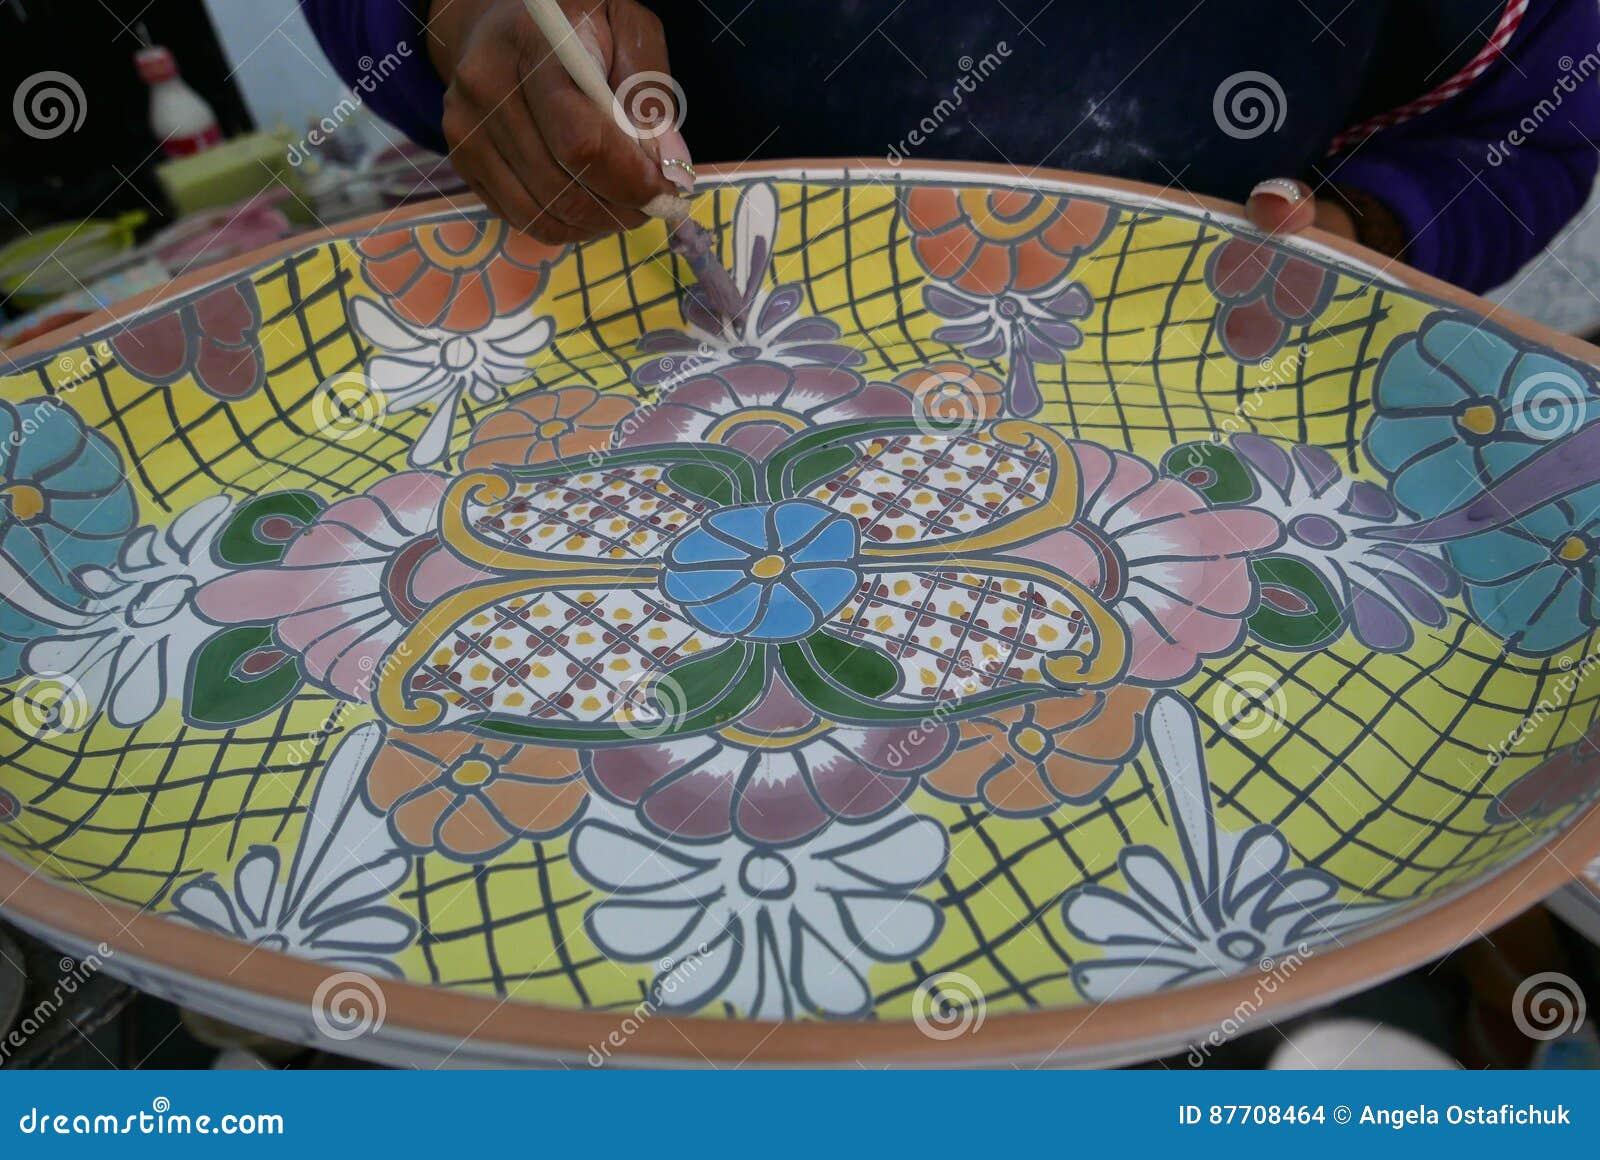 Delores Hidalgo, Mexique 10 janvier 2017 : Poterie de peinture de personnes